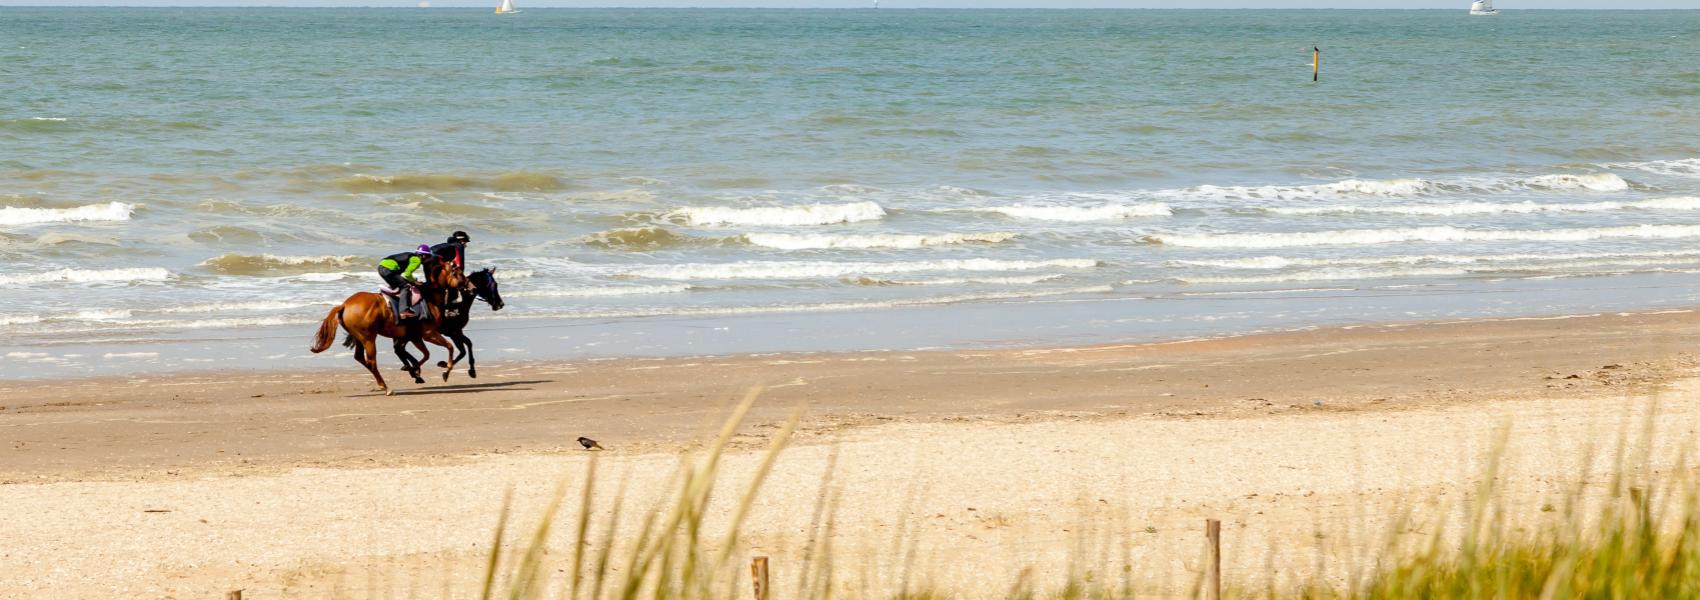 ruiters op het strand